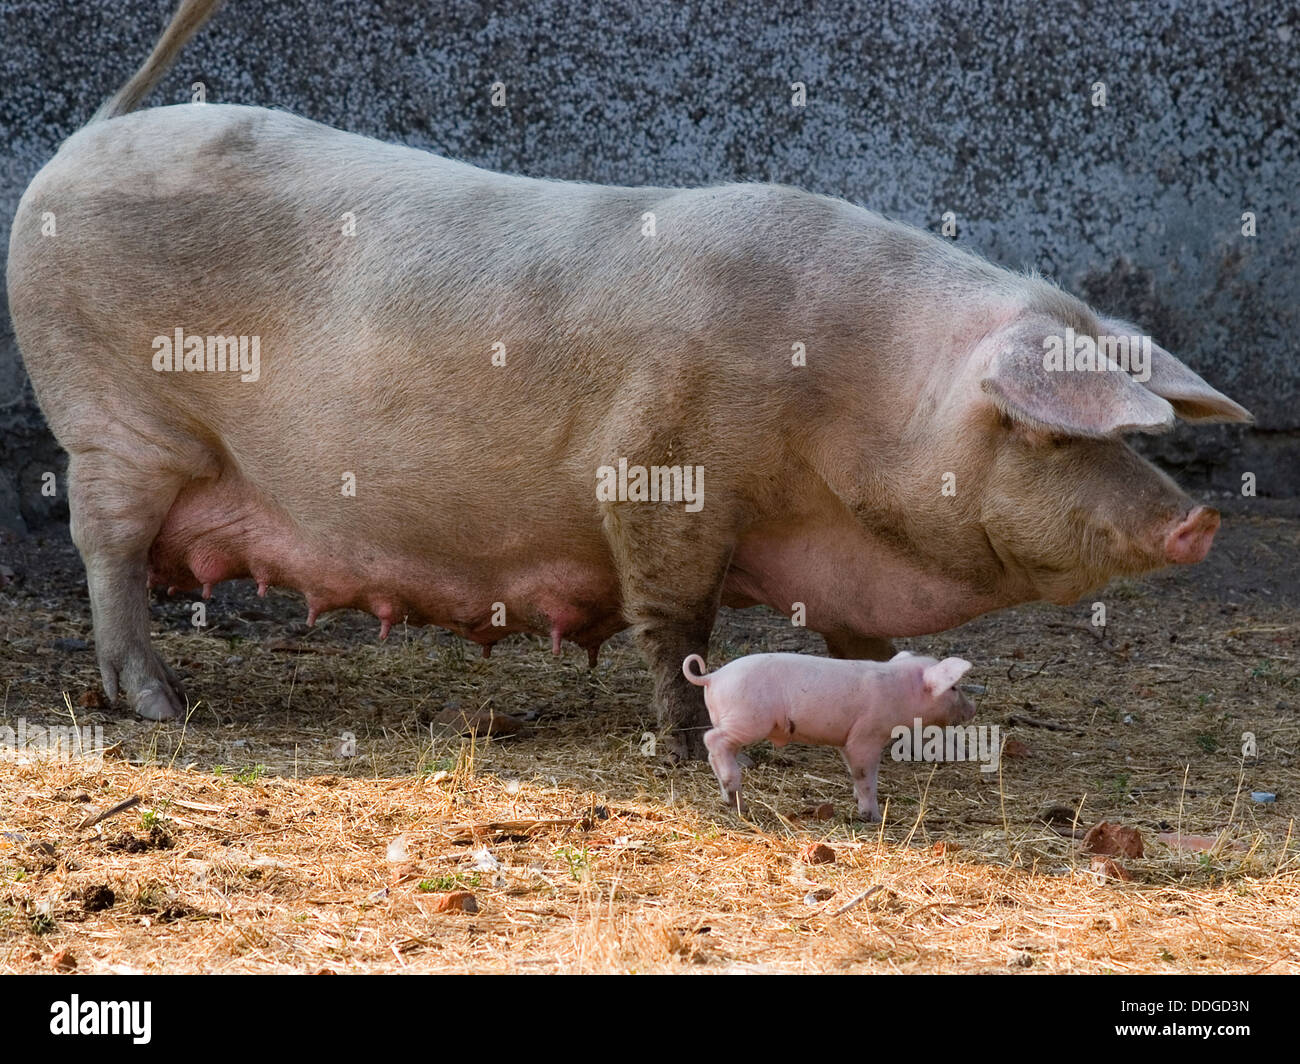 1990 Sandicast Sleeping Mother Pig